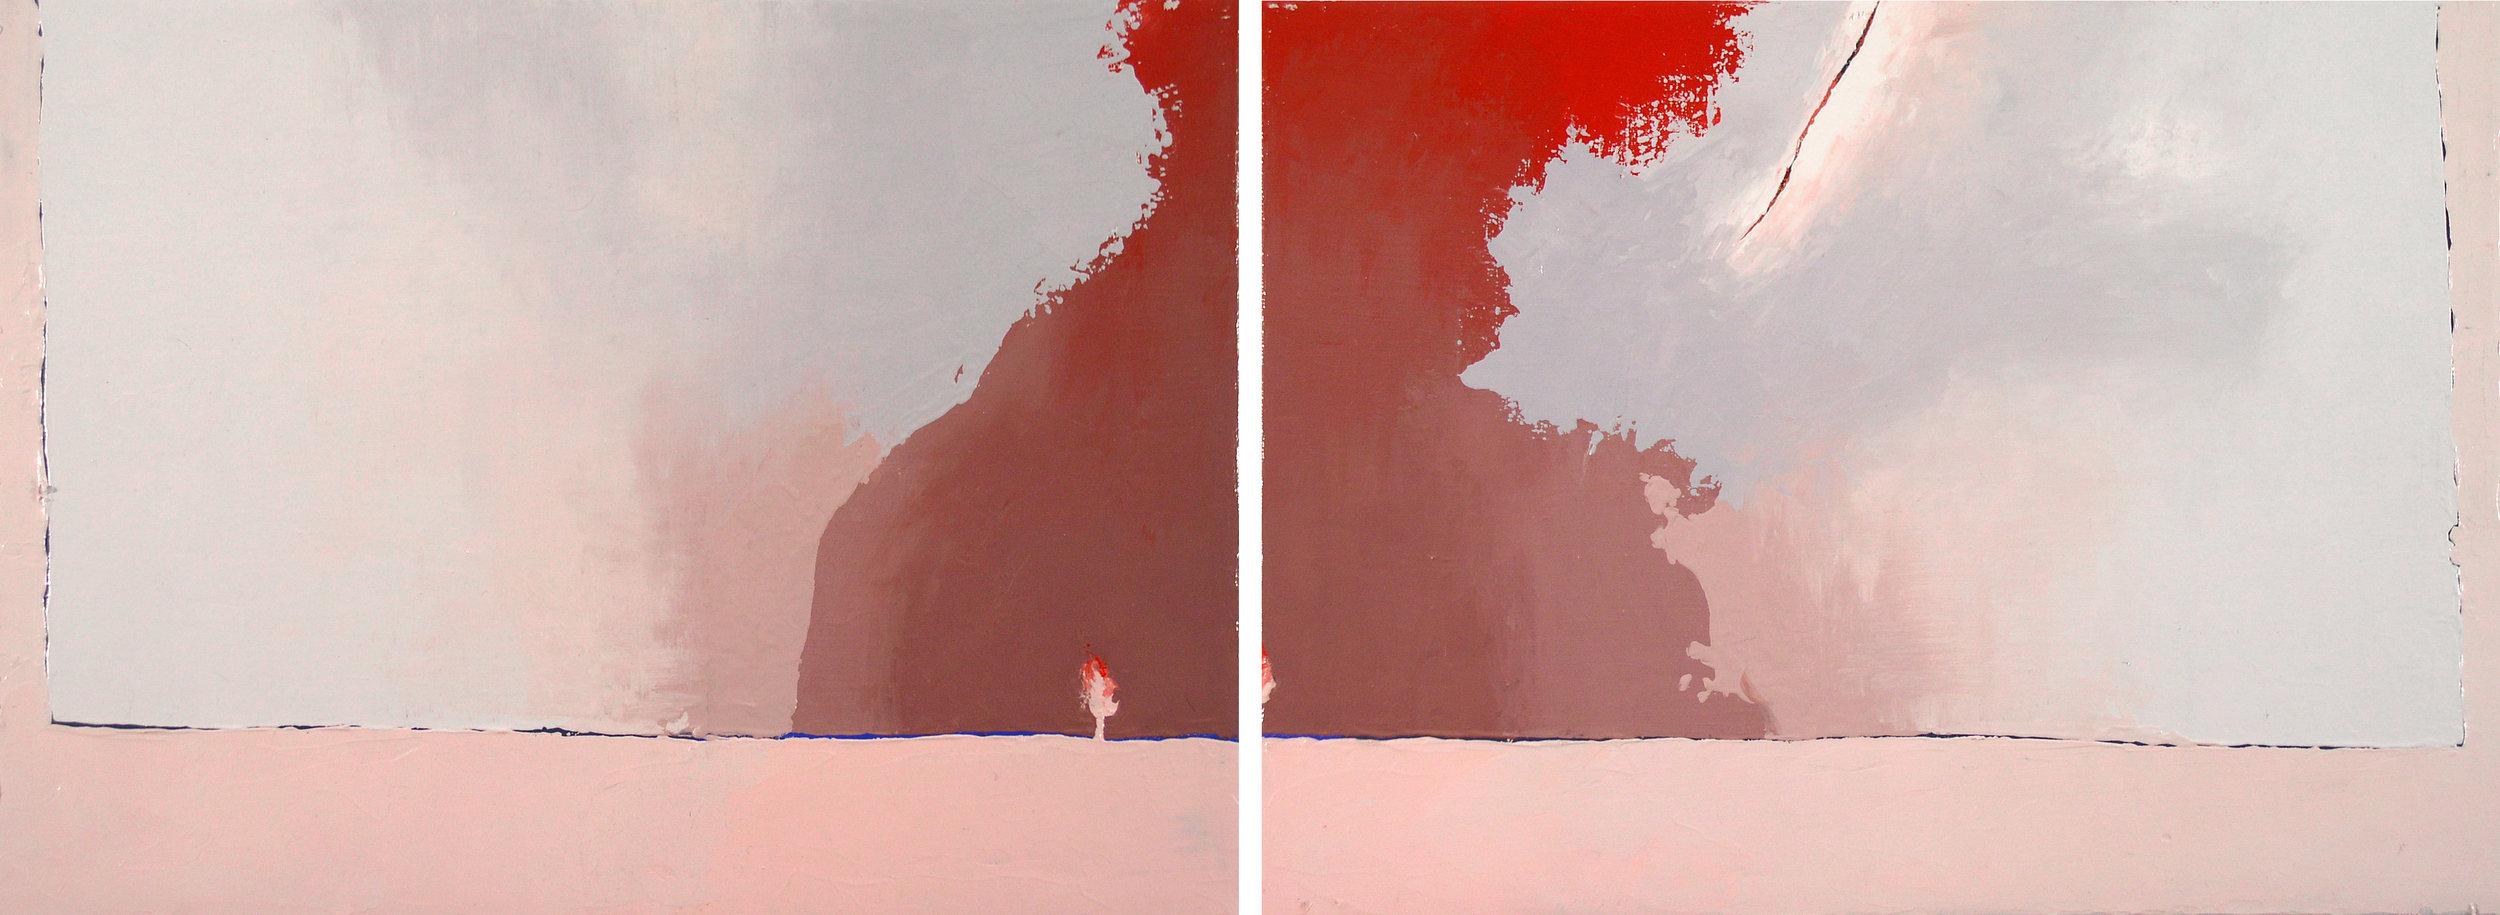 Abbey Ryan, Untitled, 2005, oil on canvas.